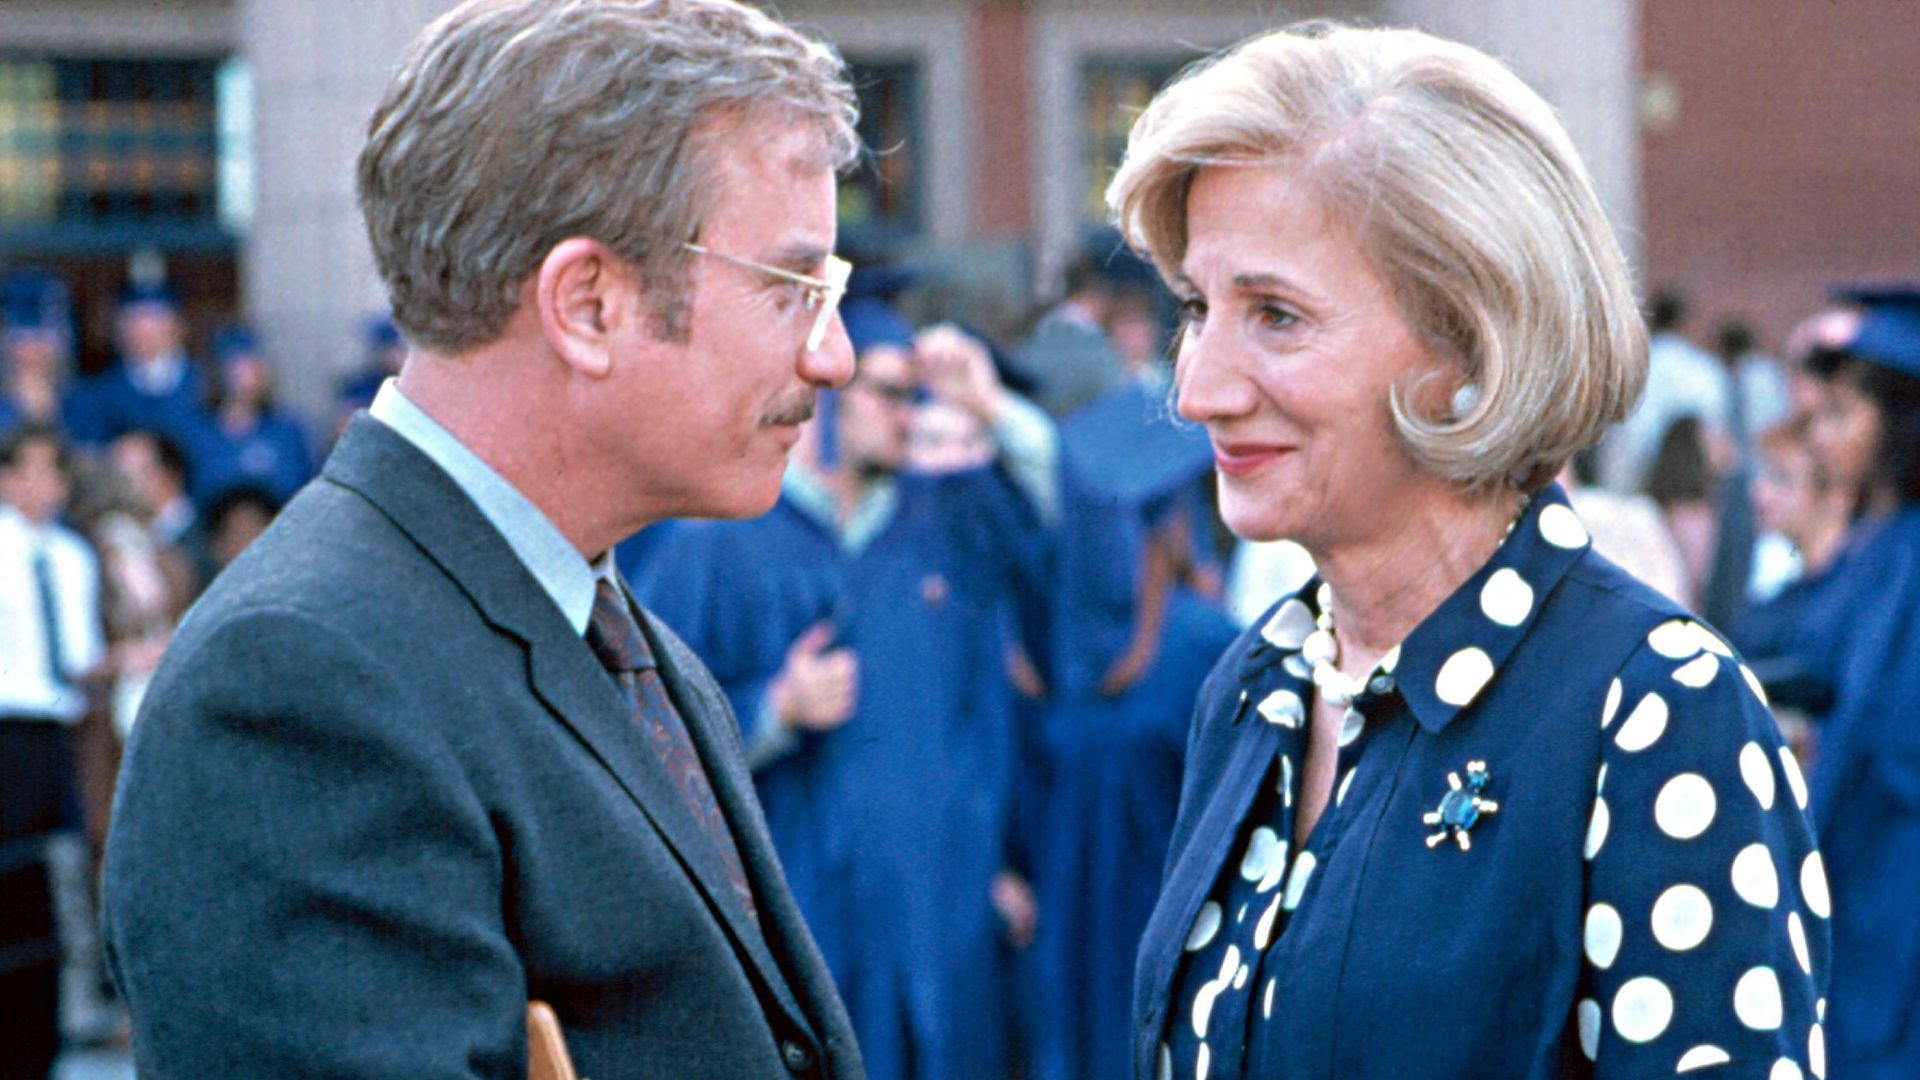 MR. HOLLAND'S OPUS, Richard Dreyfuss, Olympia Dukakis, 1995.